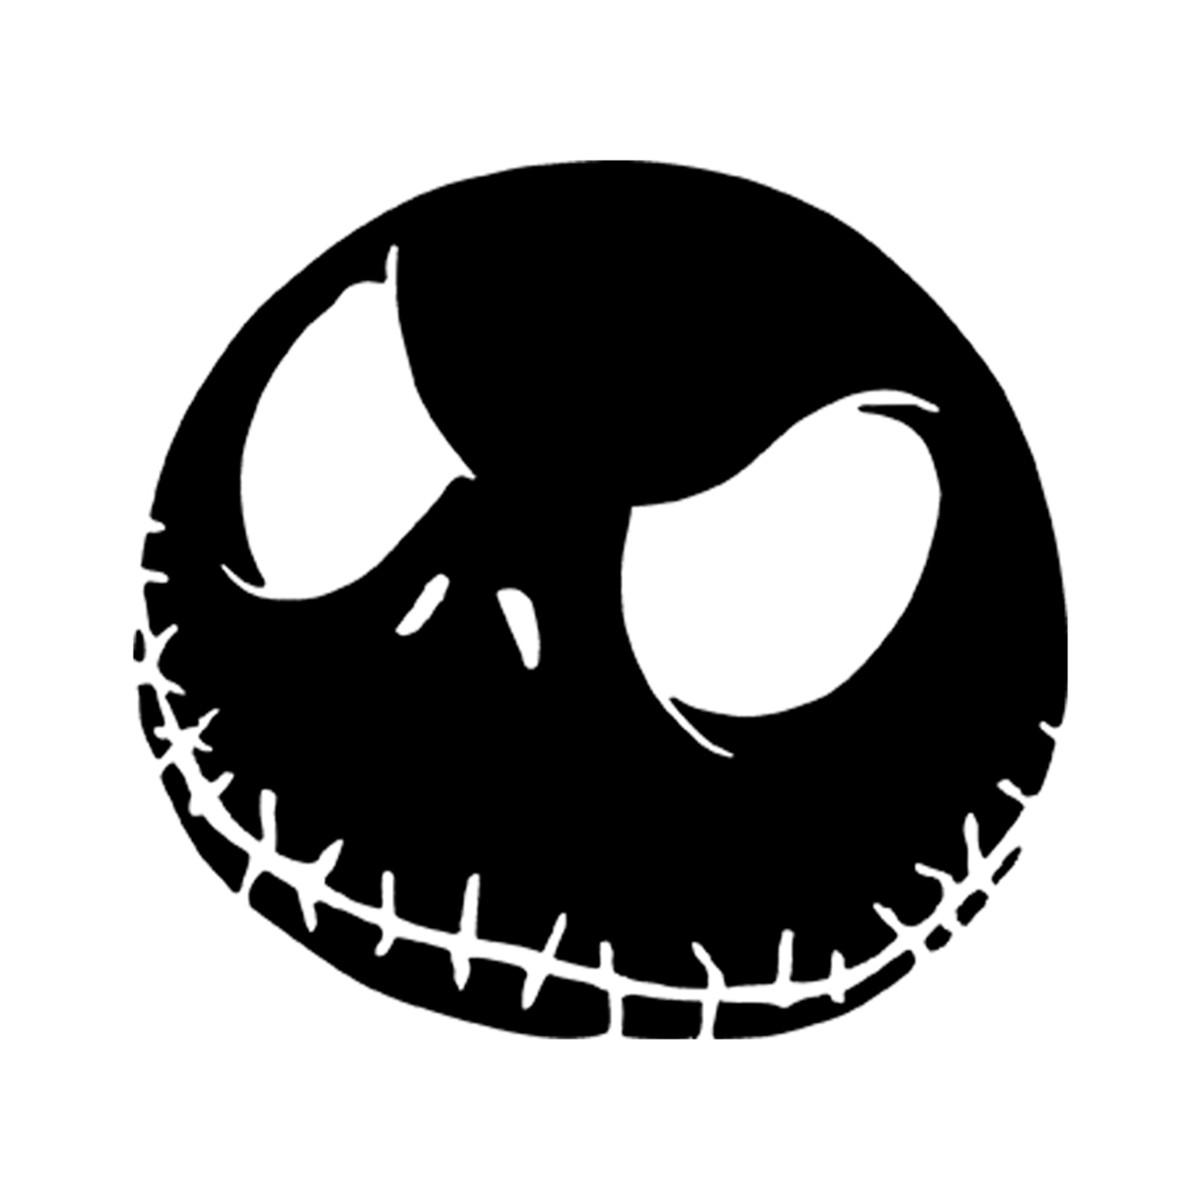 4 x jack skellington DECAL LOGO FOR CAR//VAN//LAPTOP VINYL STICKER FUNNY halloween